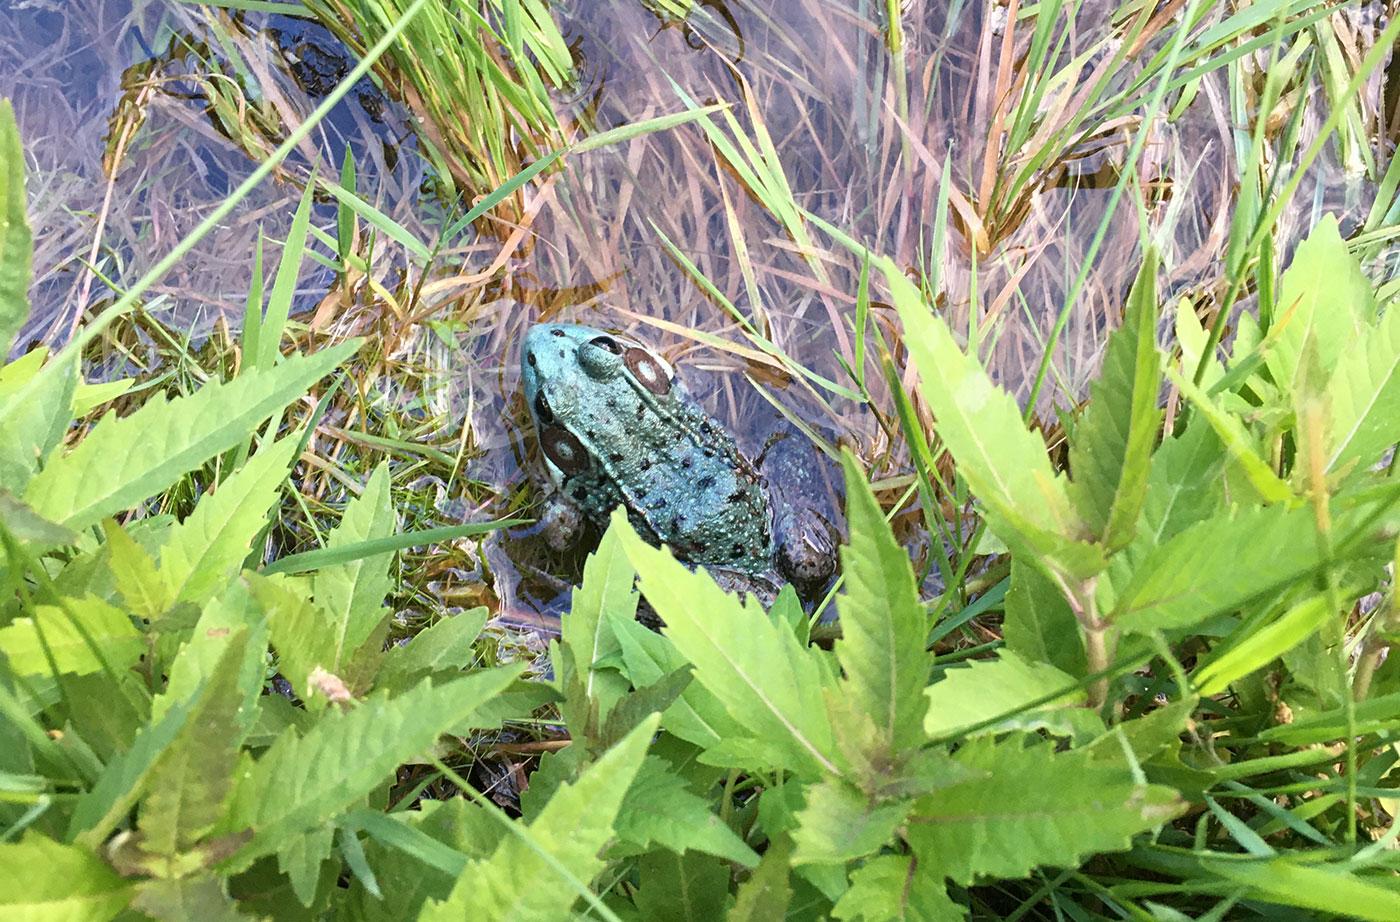 Frog in Bowdoinham